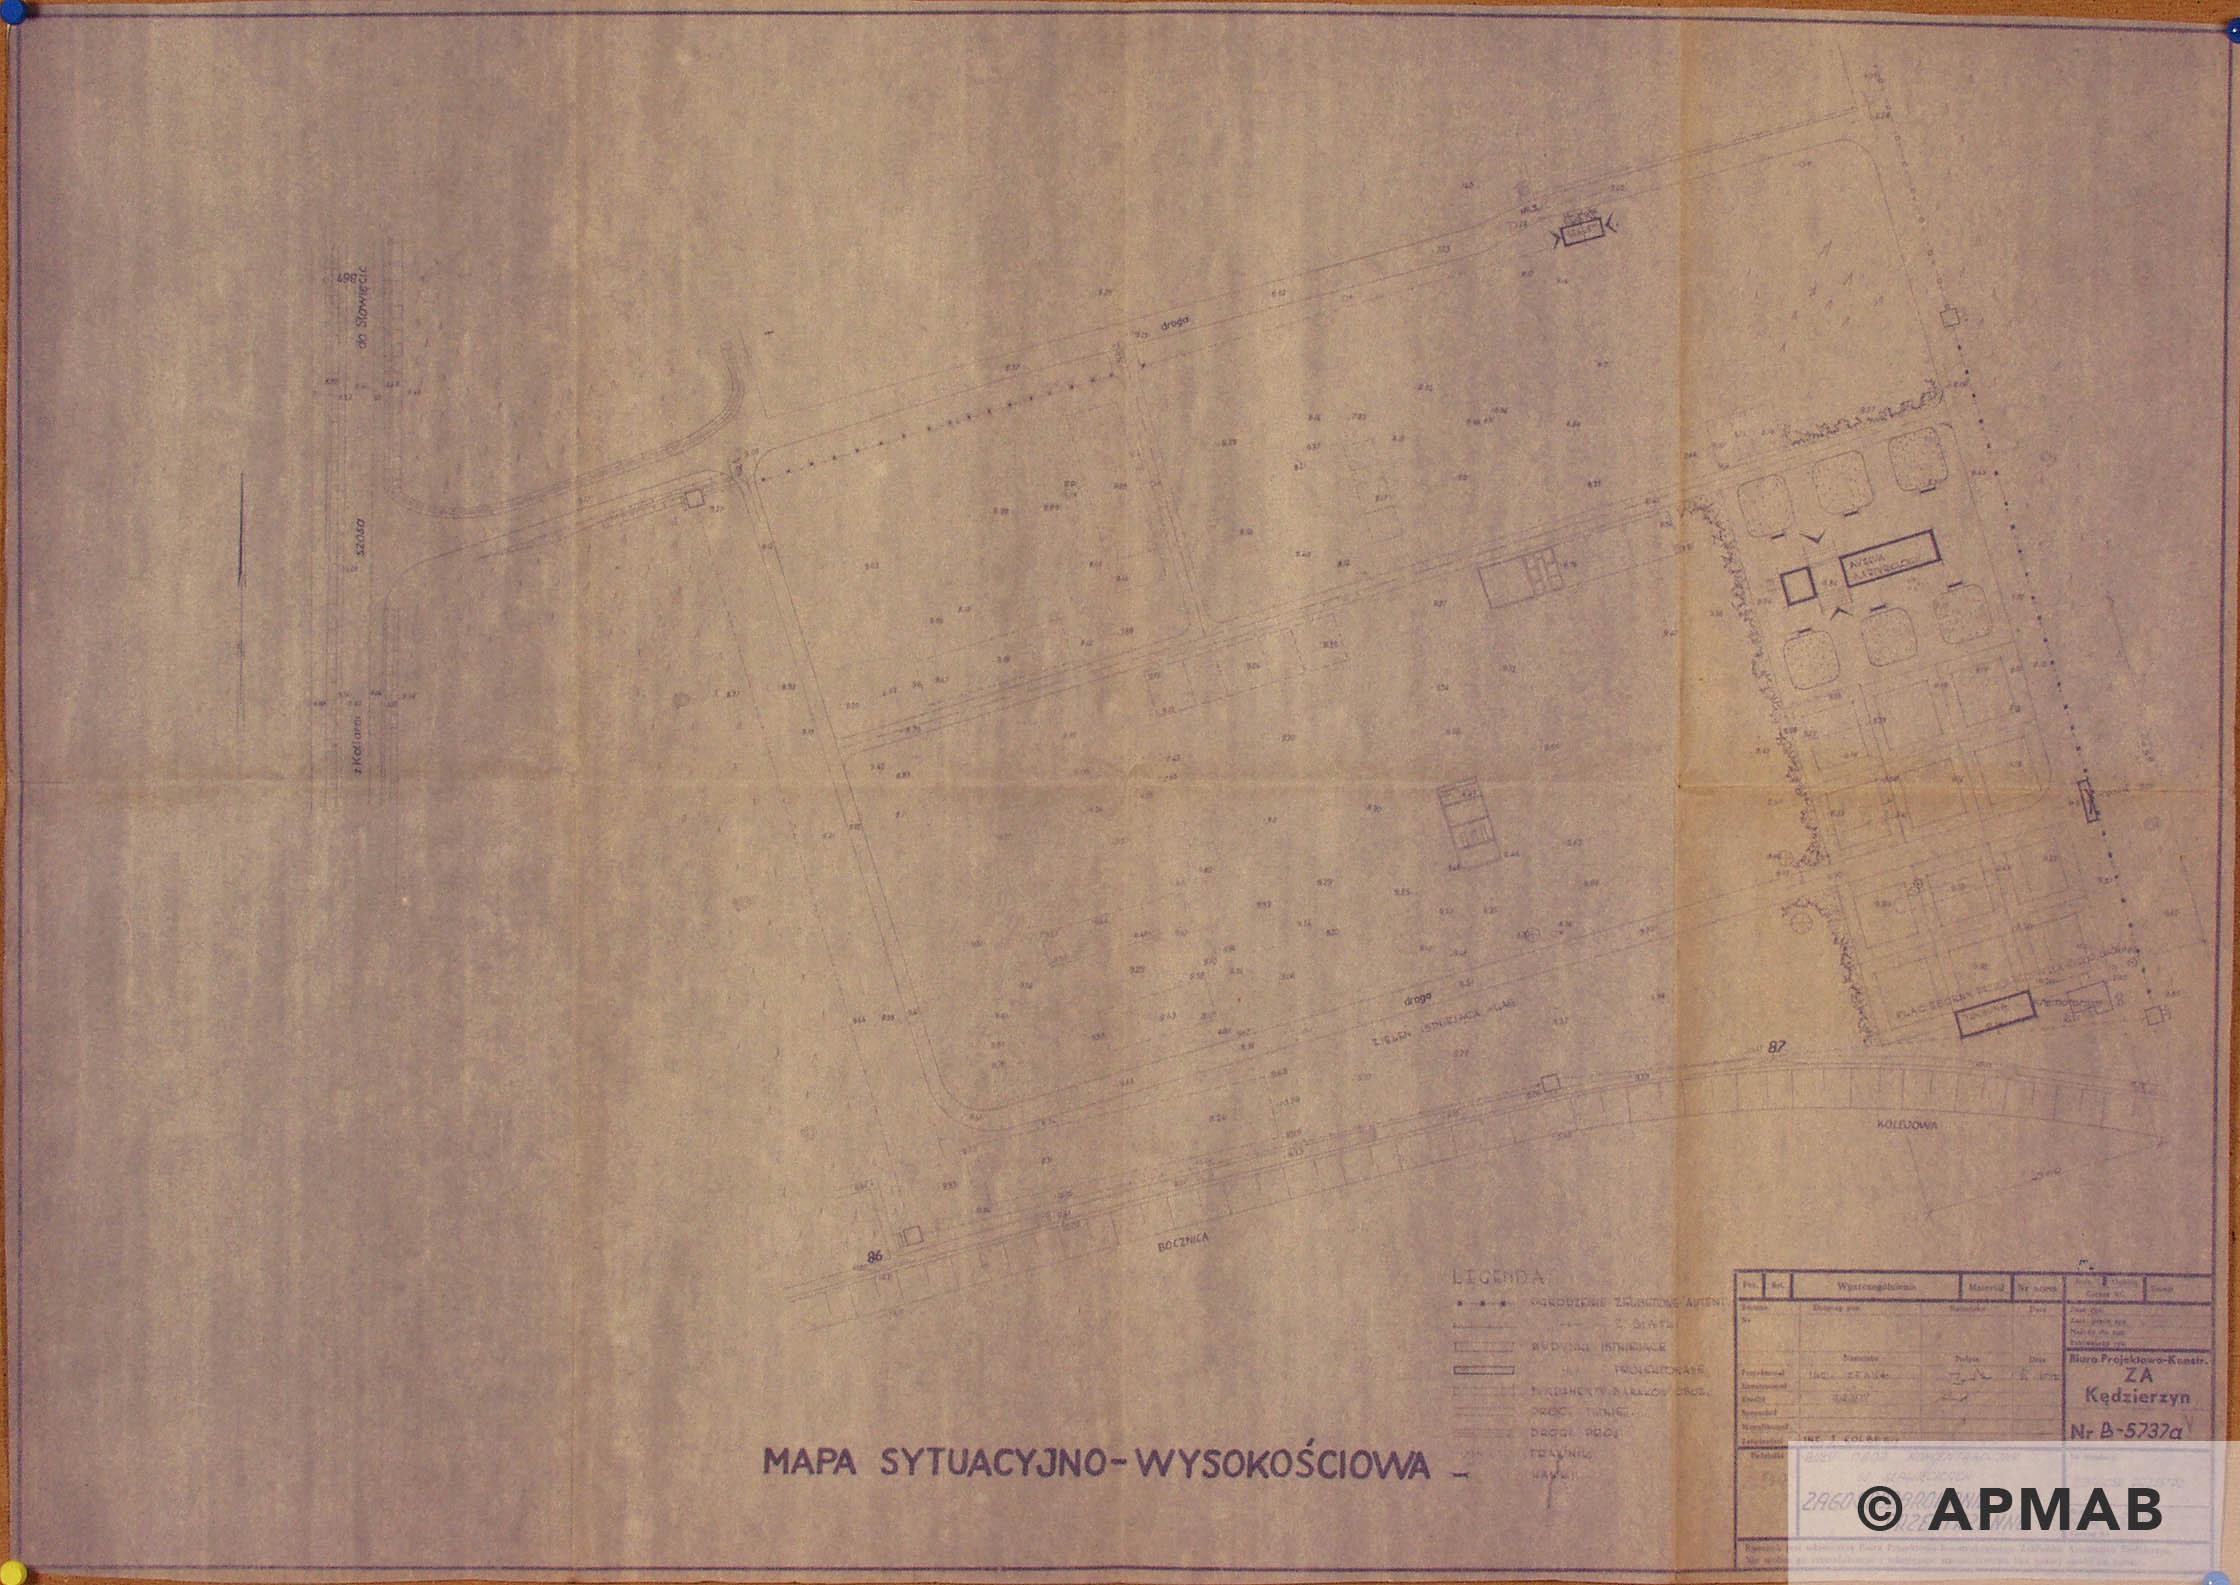 Hydrierwerke plan. APMAB